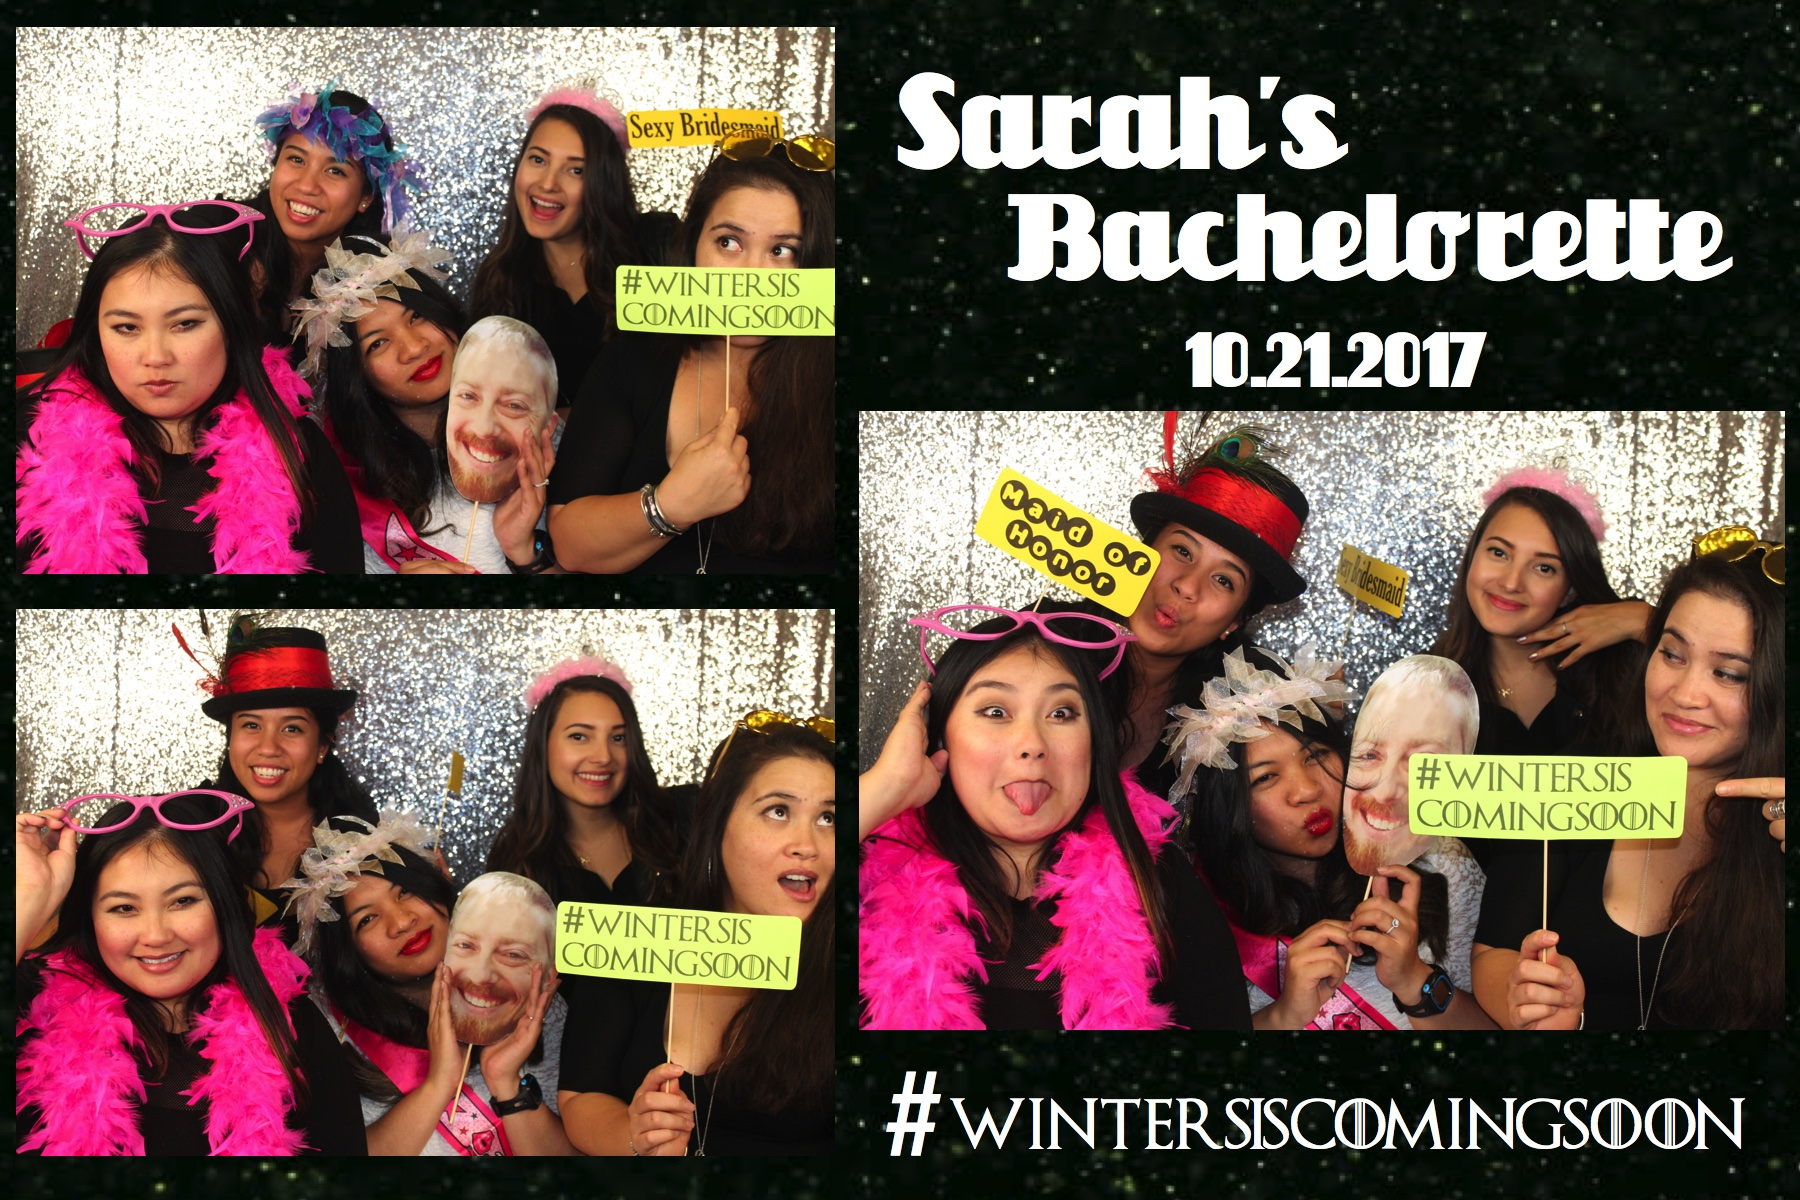 Sarah's Bachelorette